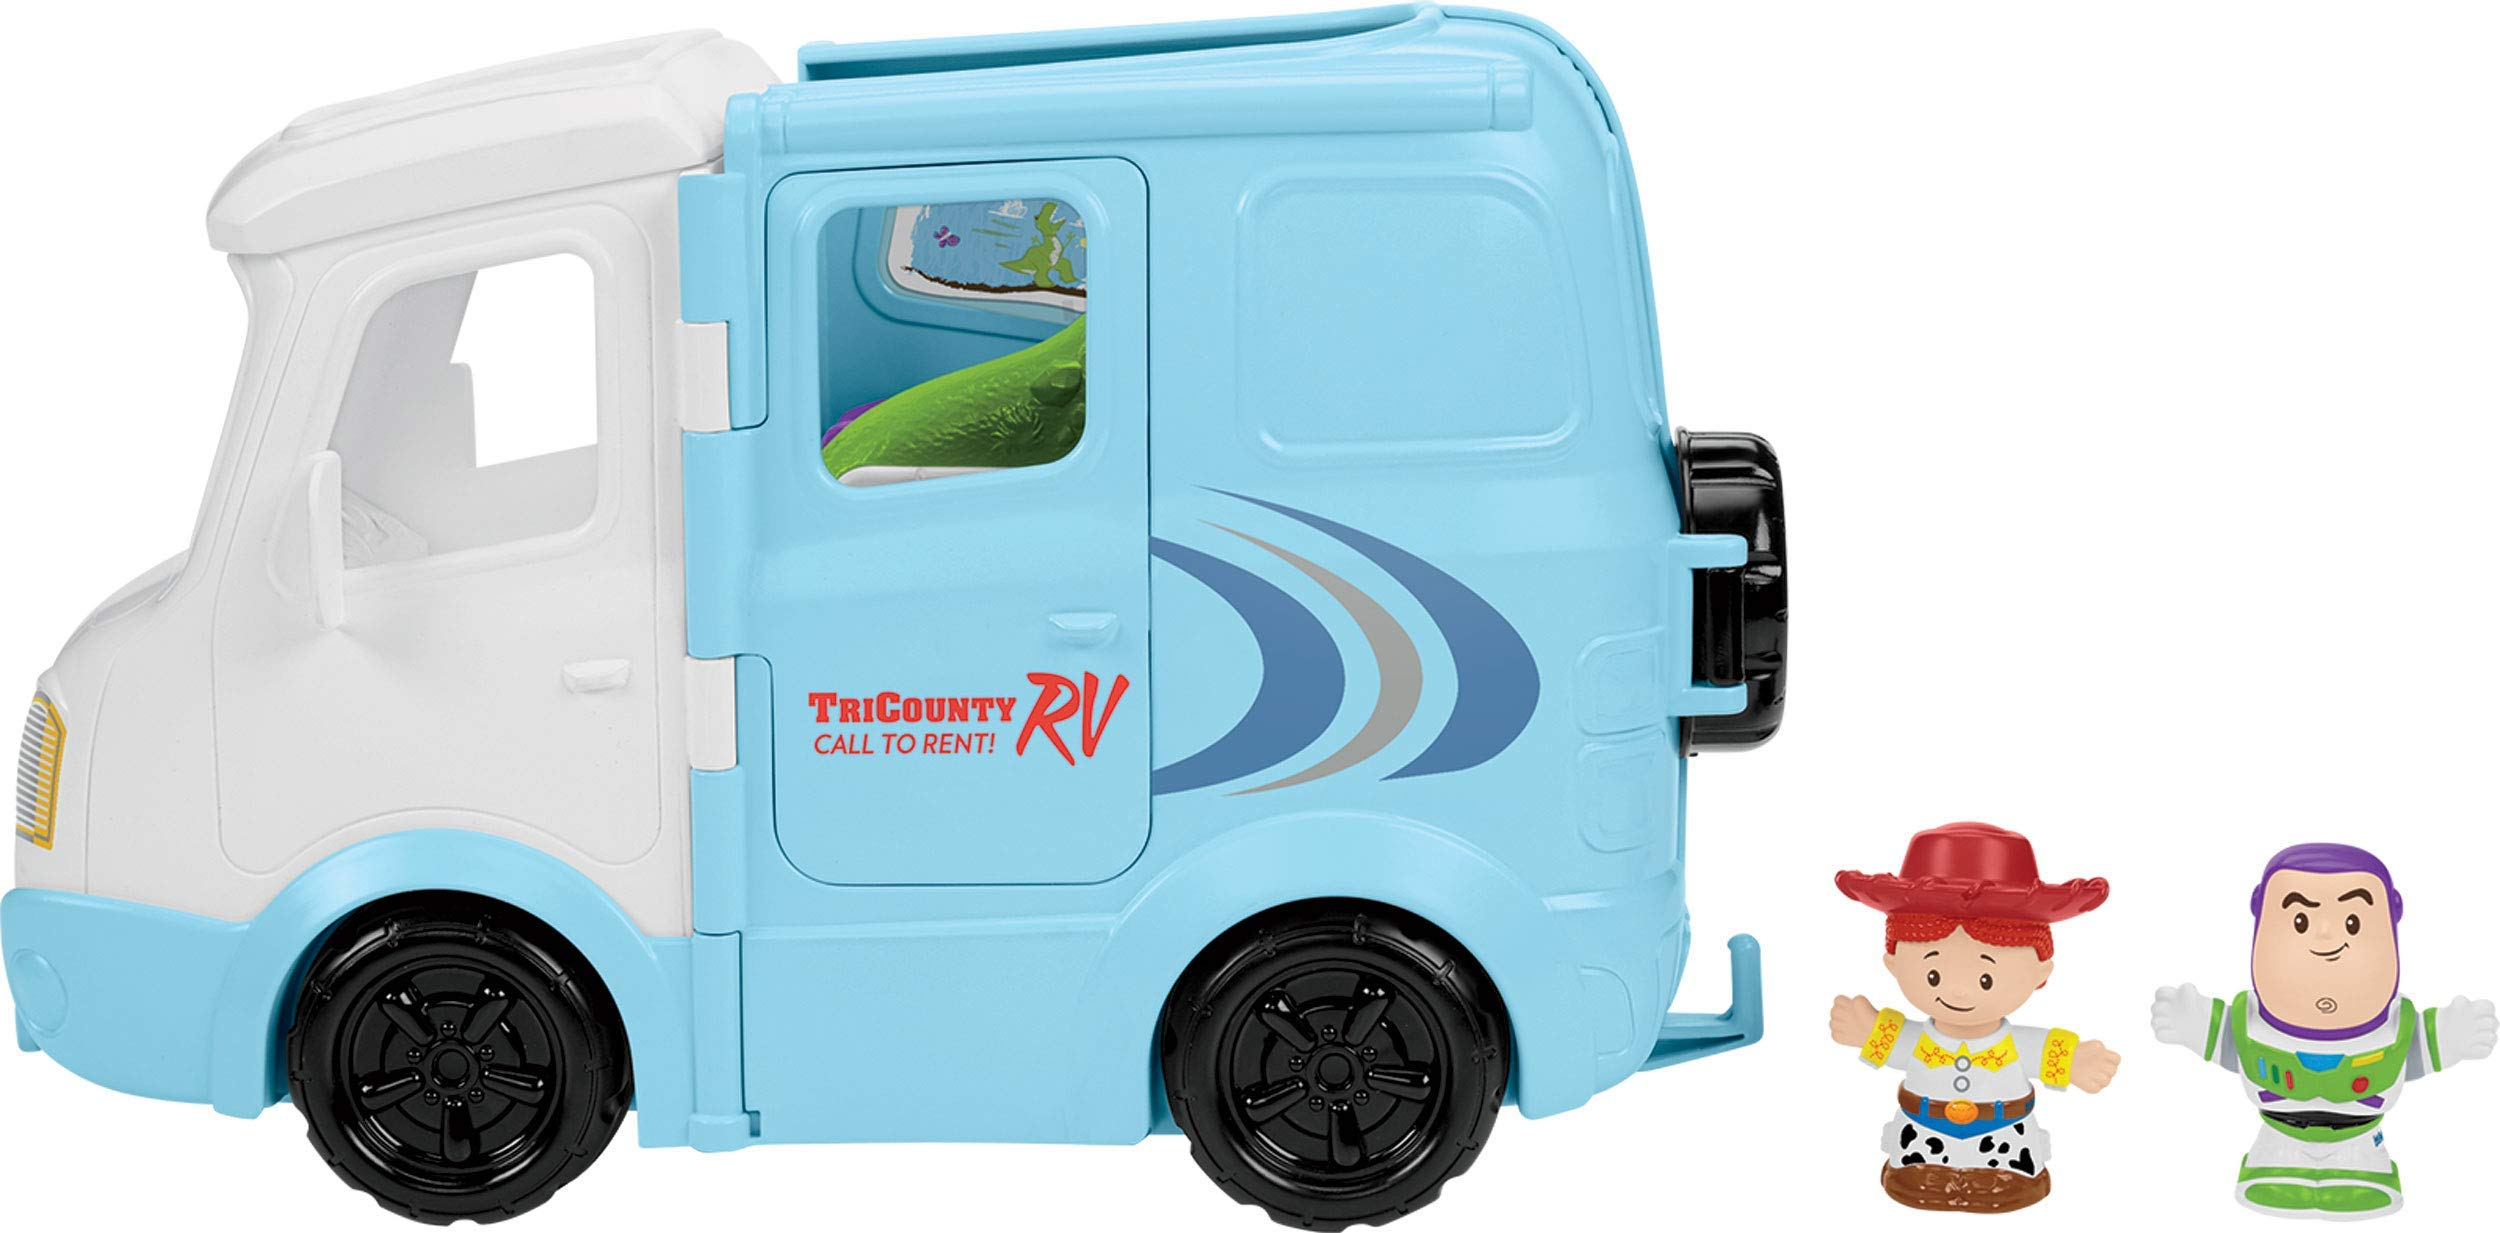 Fisher-Price Disney Pixar Toy Story 4 RV (Renewed)